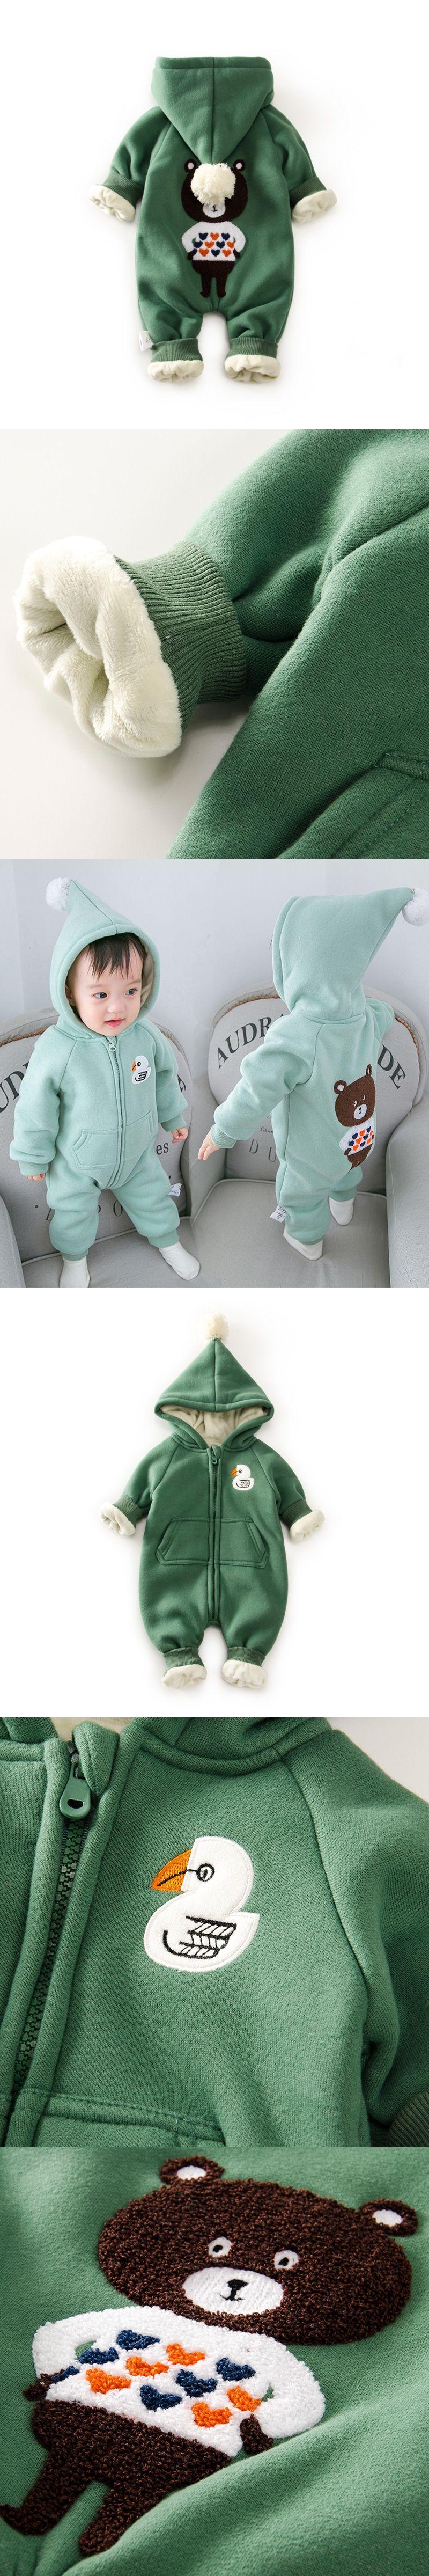 eac604dc0 10 Degree Winter Warm Fleece Baby Romper Hooded Newborn Clothes Bear ...